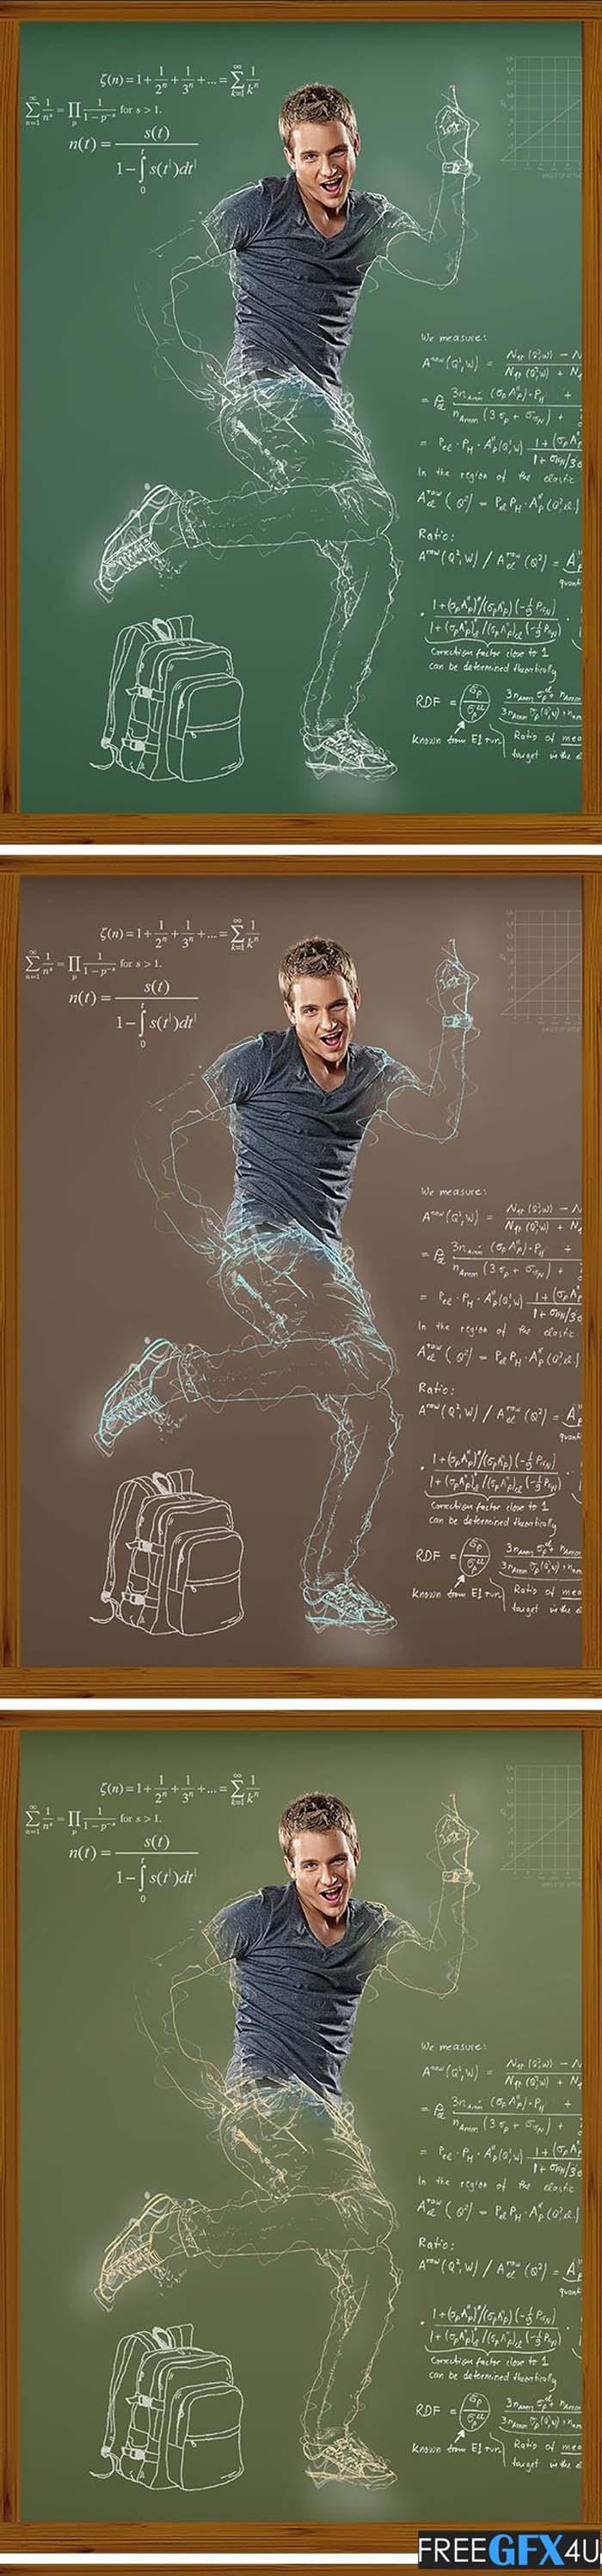 Chalk Photoshop Action